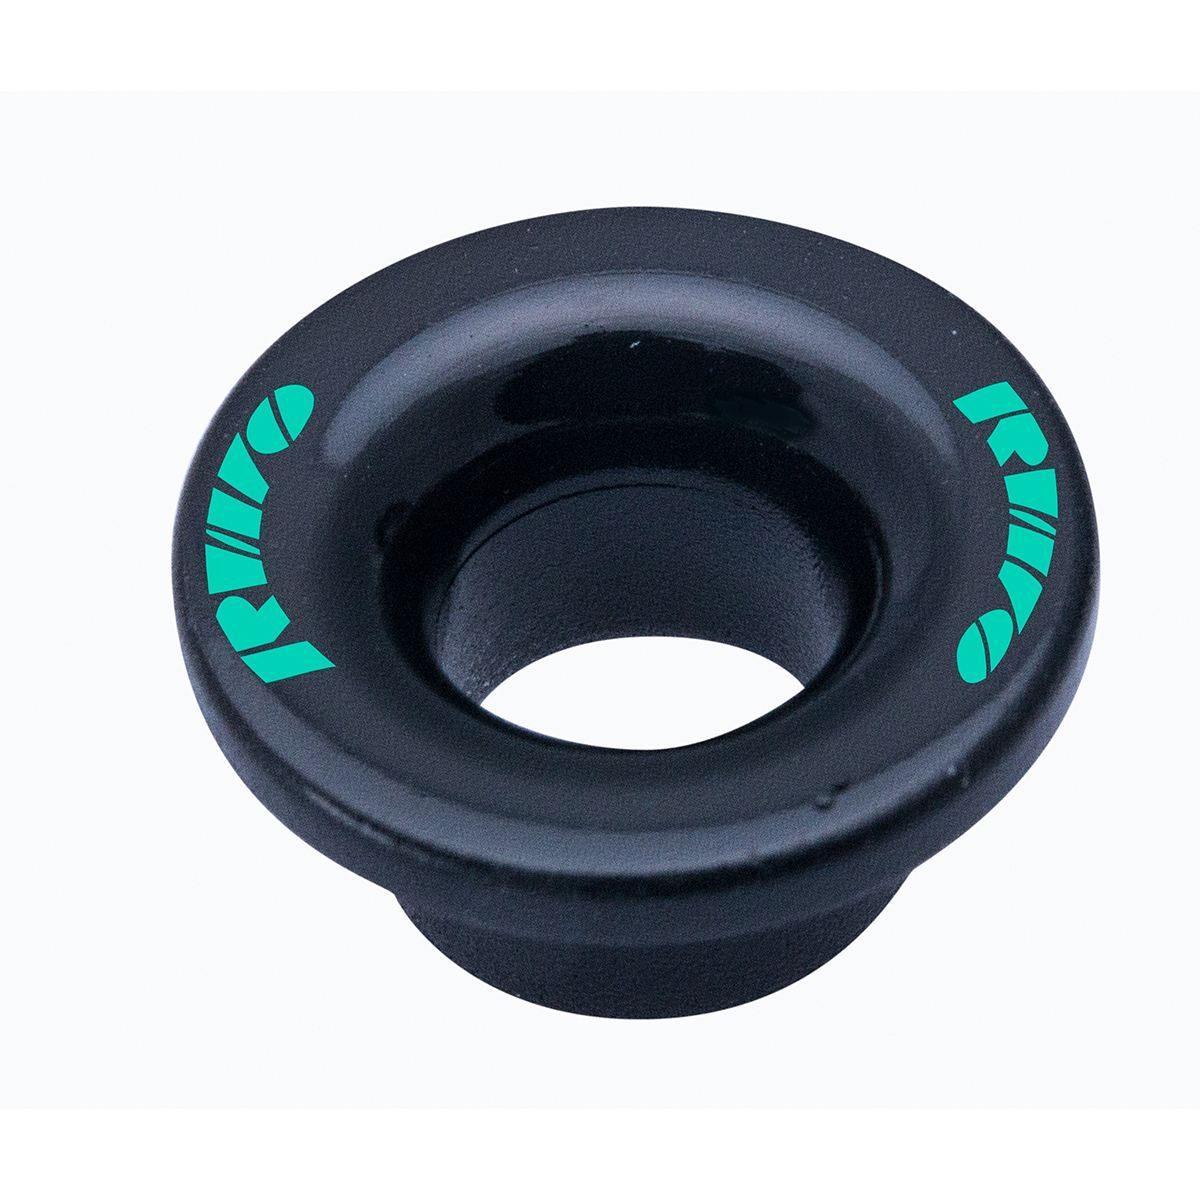 R8360 - 7mm Thru Deck Low Friction Bush